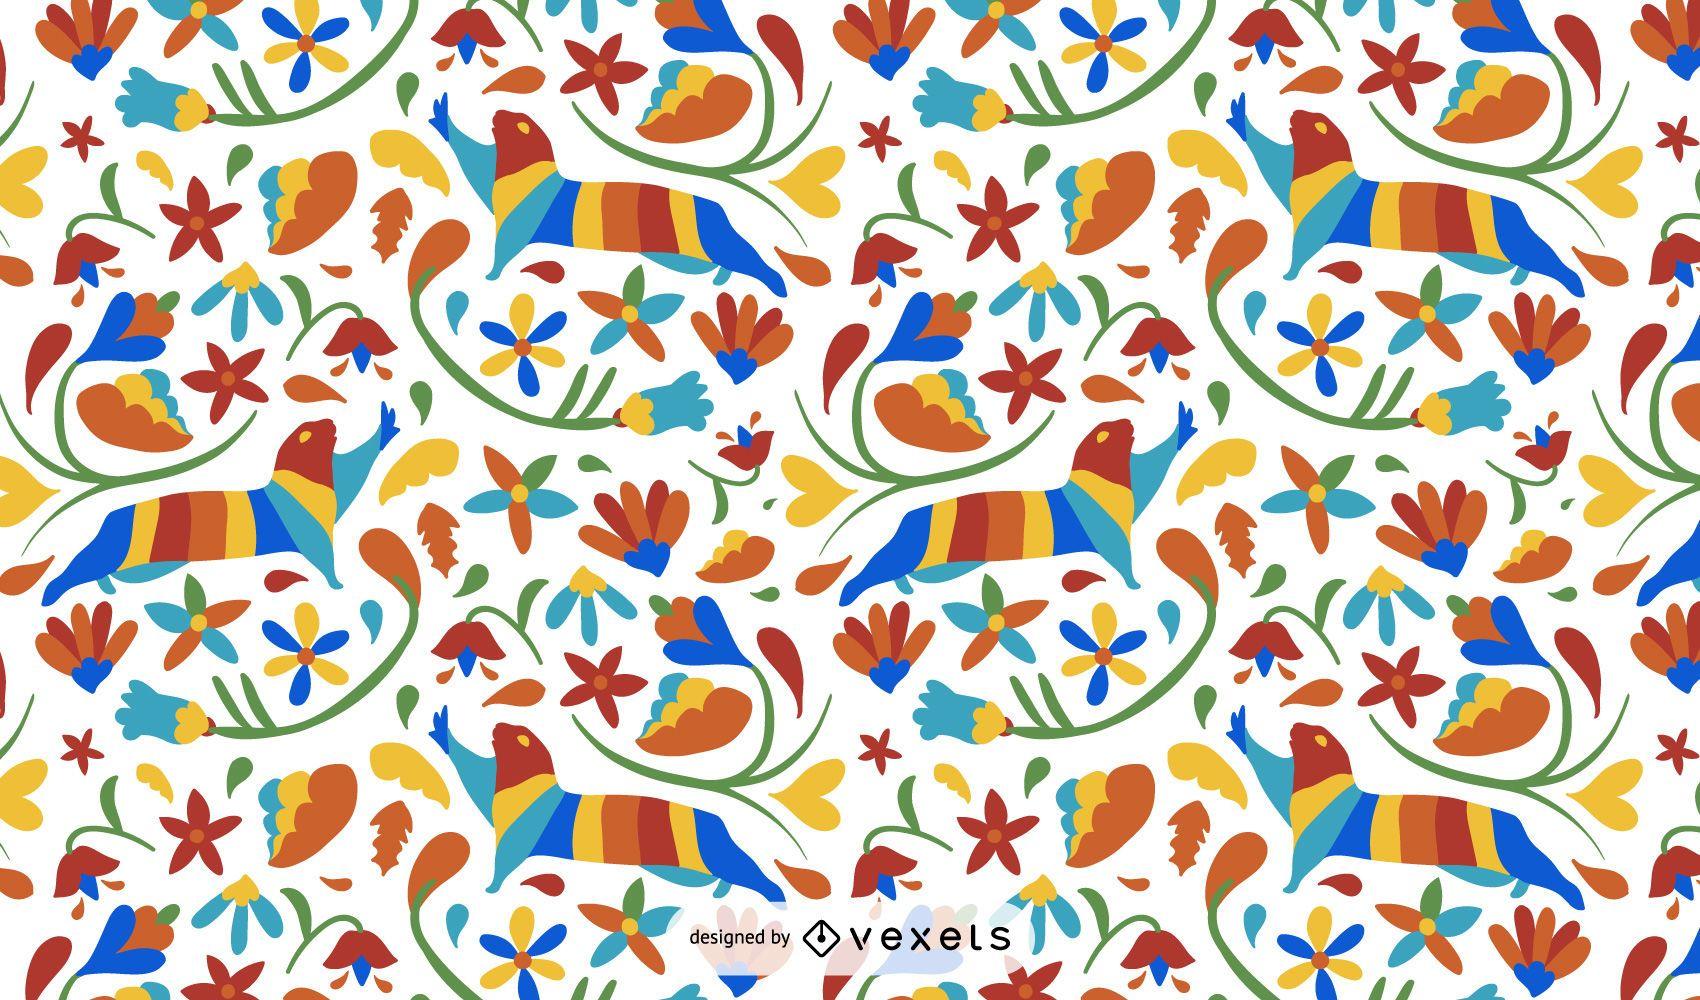 Otomi style otter pattern design